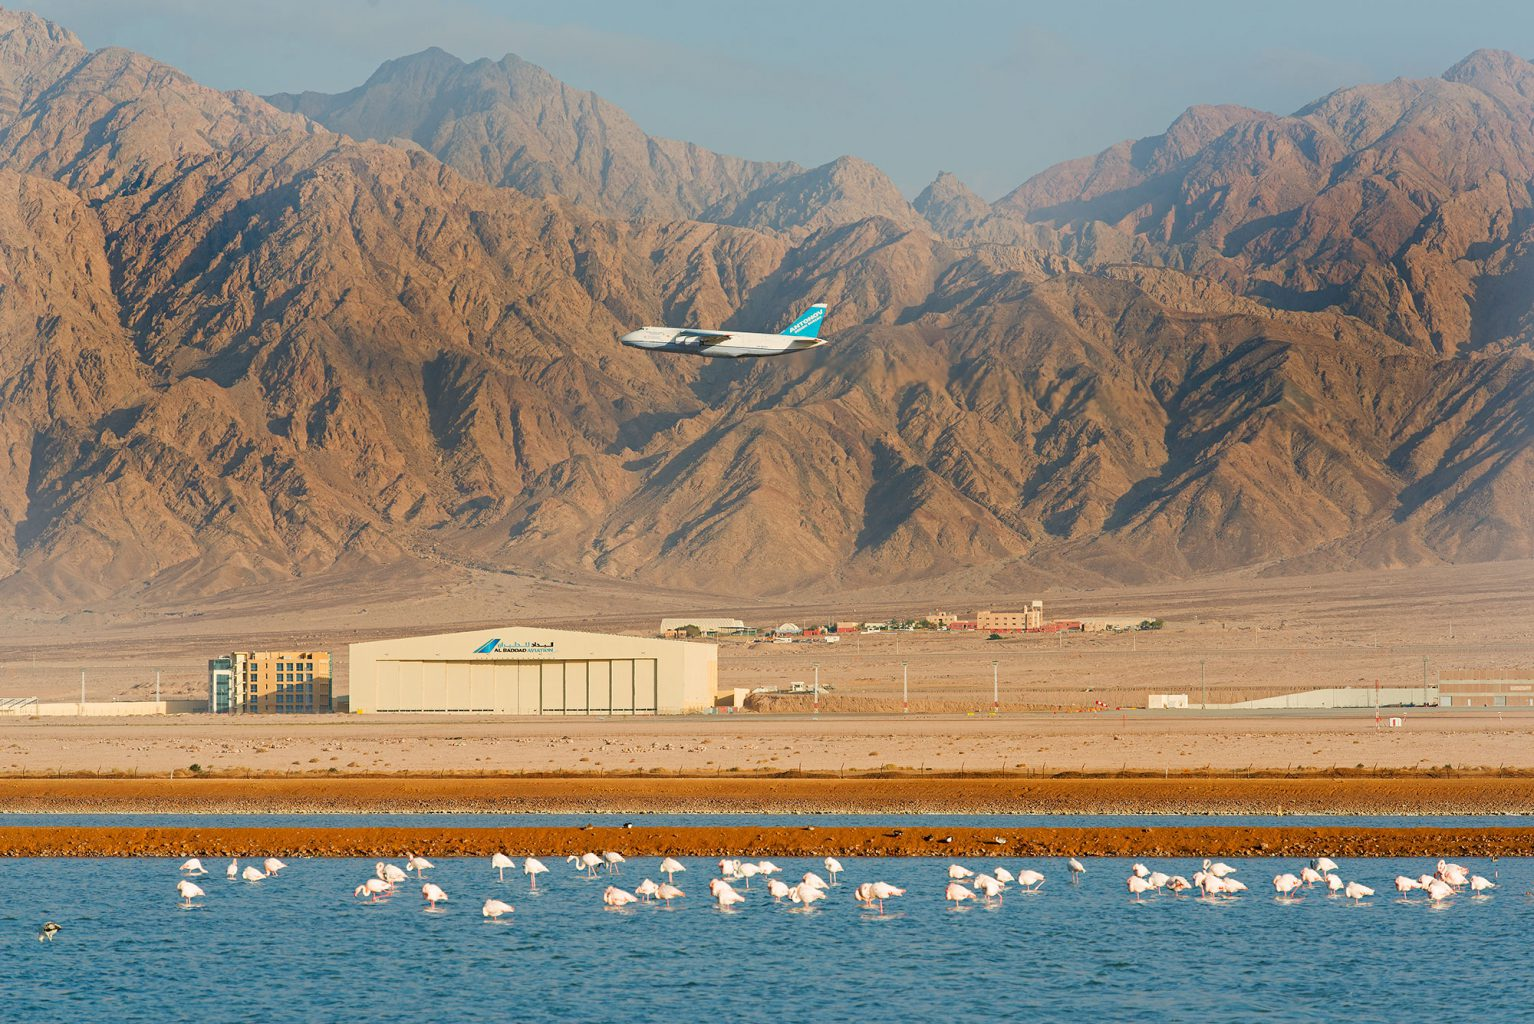 Akaba Airport, Israel - Jordan Border, Eilat - Israel